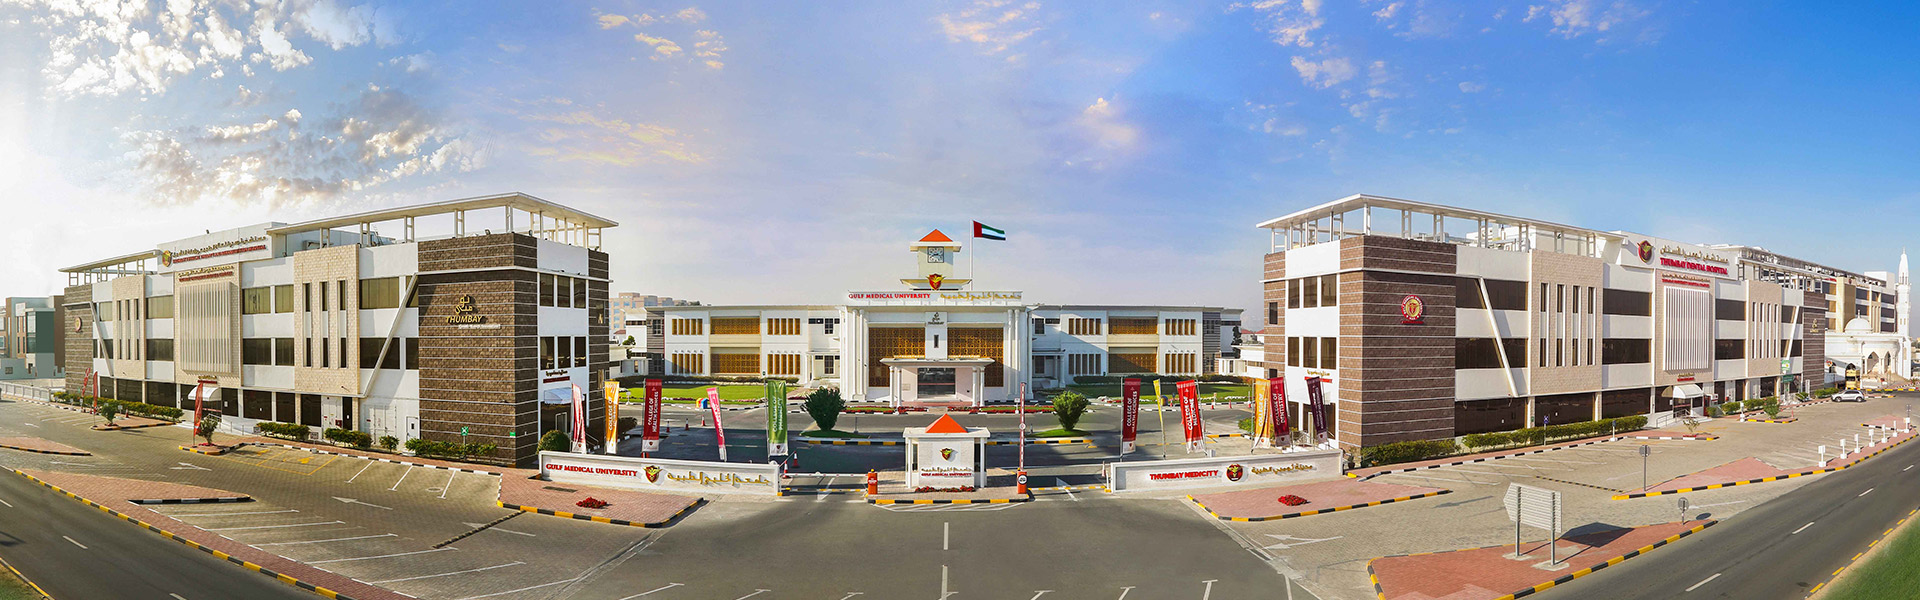 Thumbay Hospital providing Best Healthcare to the Region